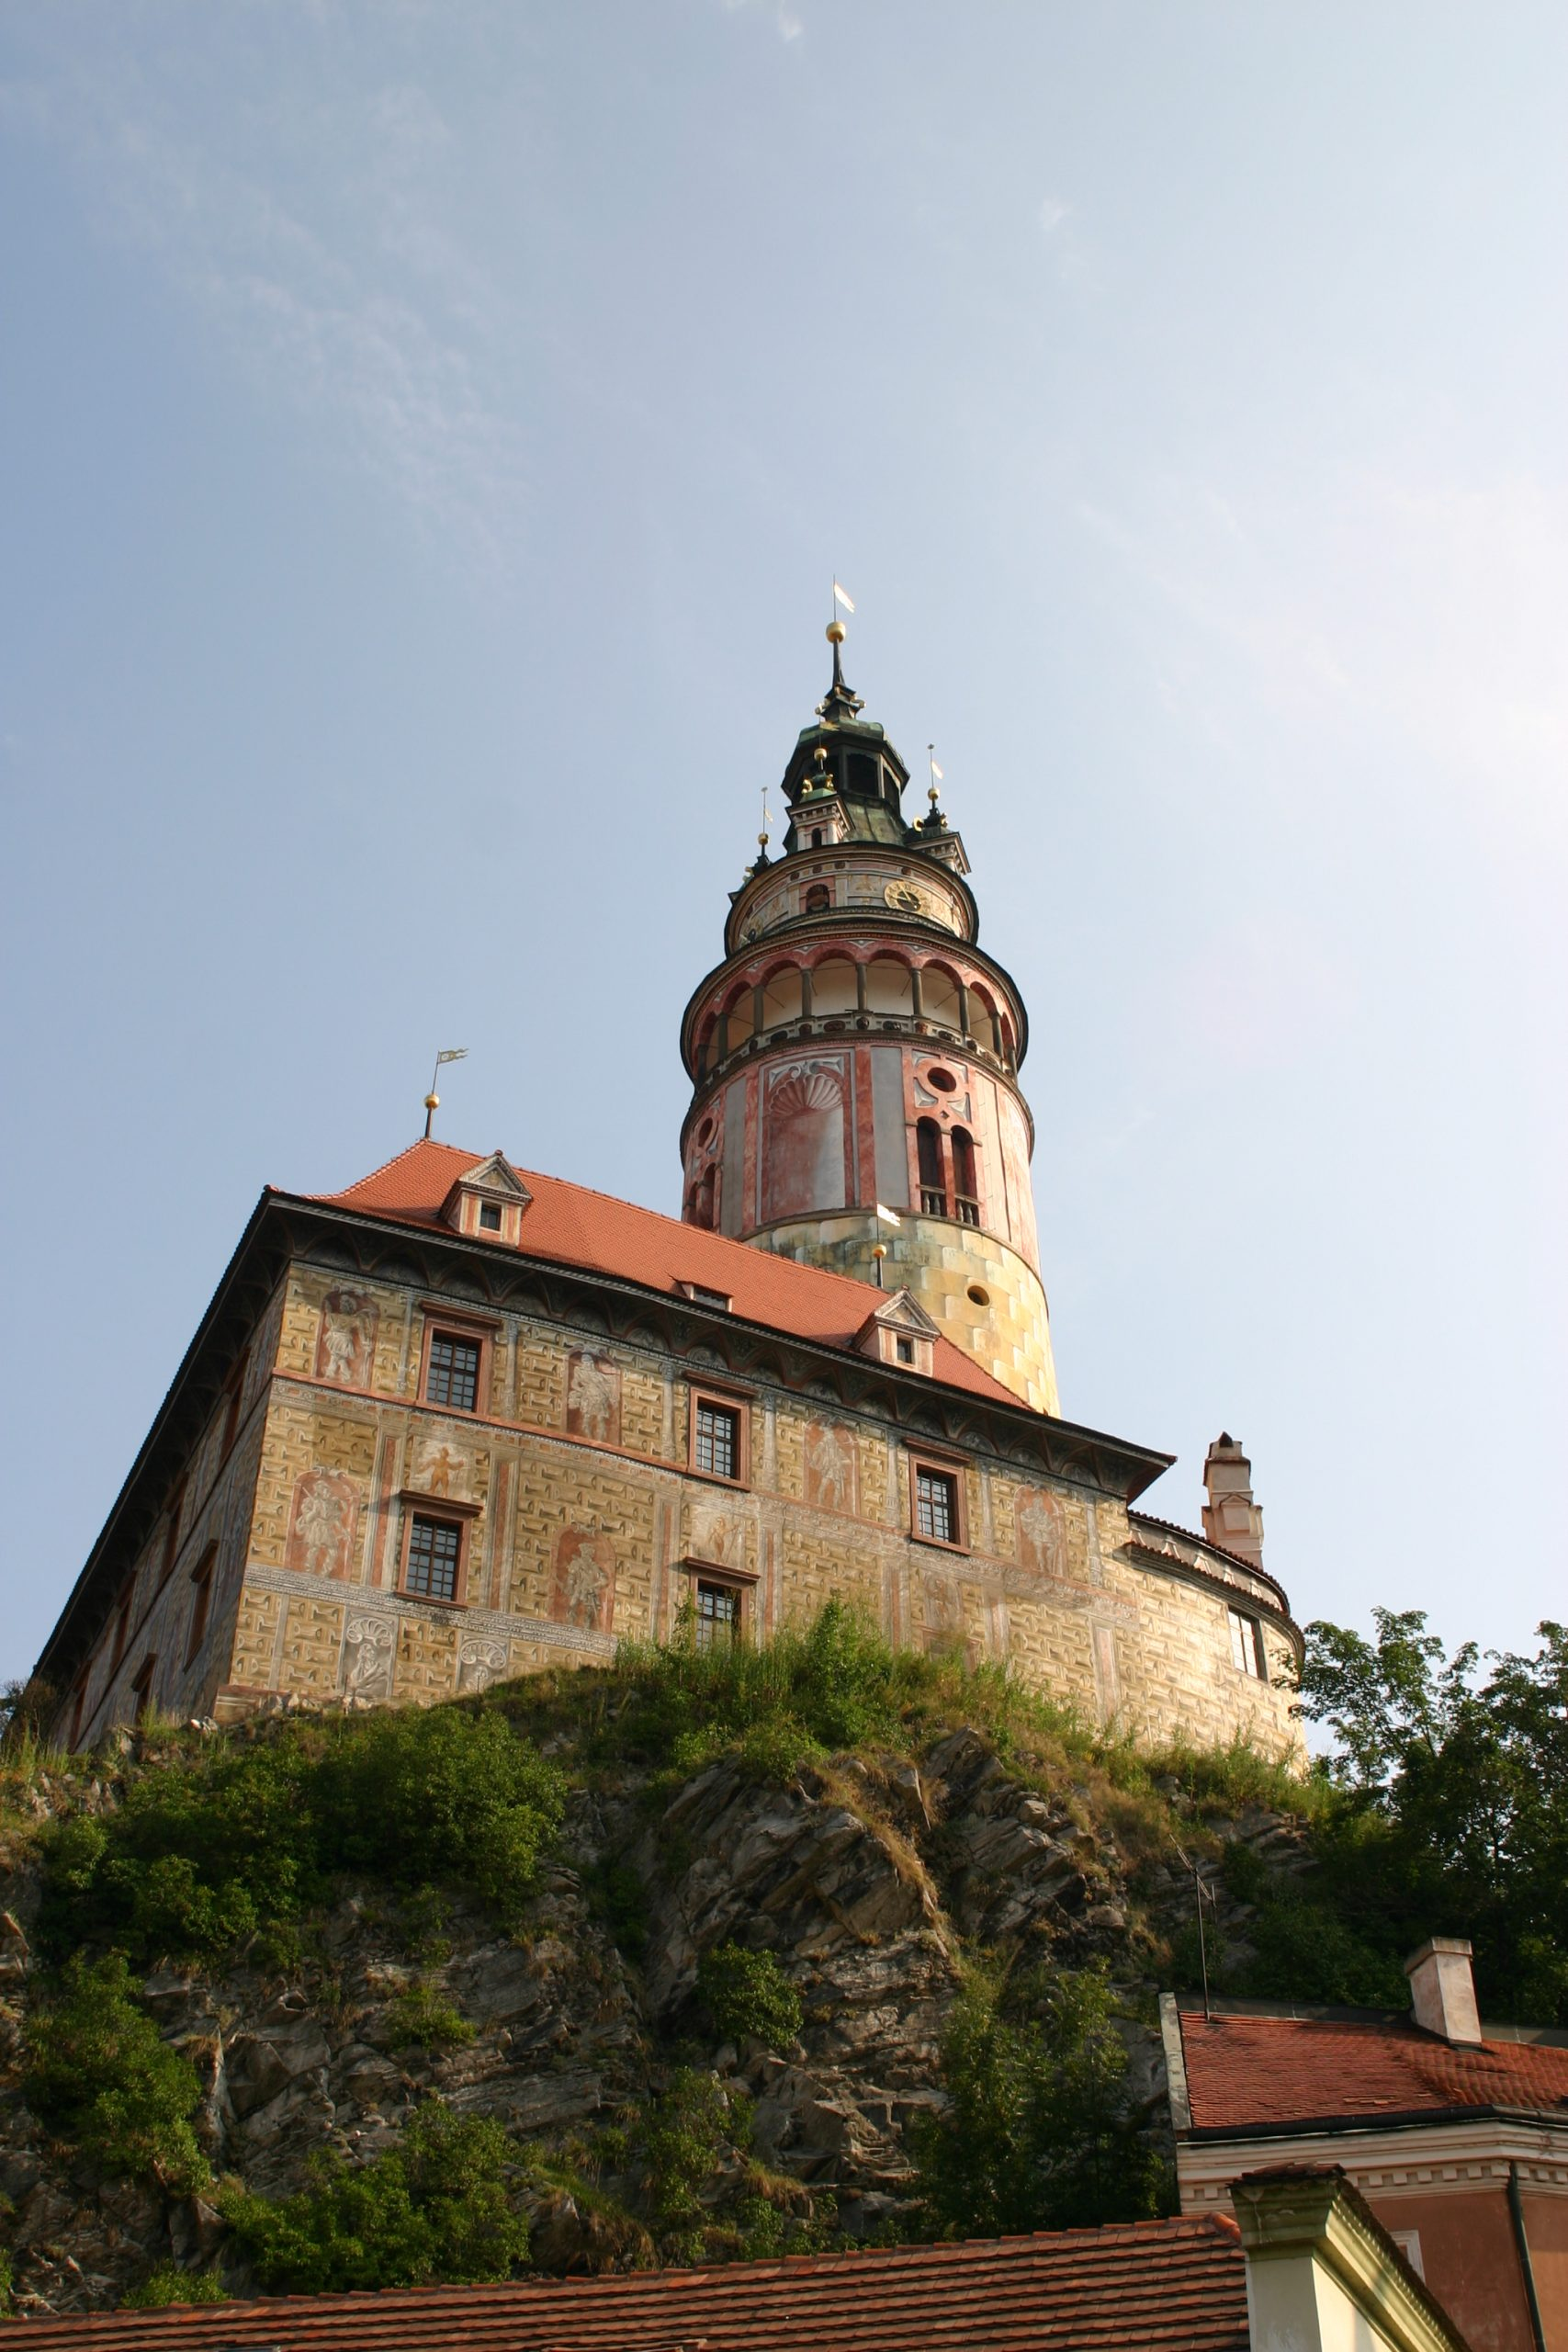 ck小鎮自由行攻略 歐洲最美小鎮庫倫洛夫 Český Krumlov完整交通、住宿、景點推薦